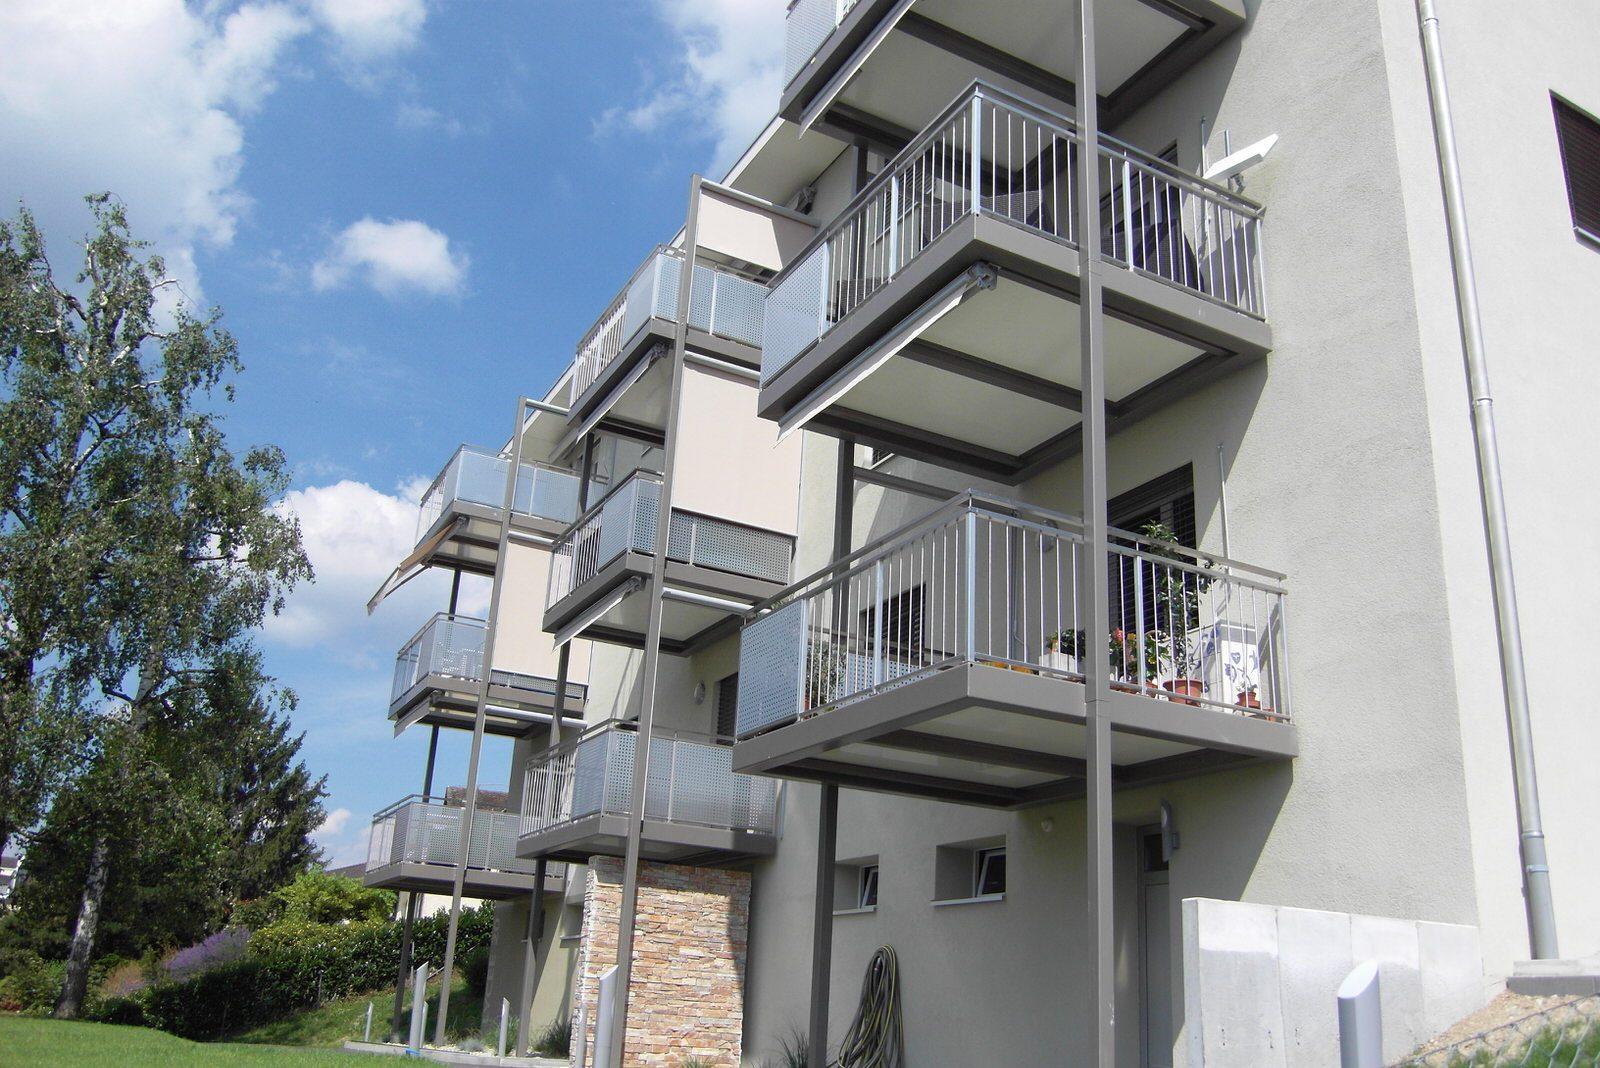 forbis balkon und treppenbau gmbh balkone treppen. Black Bedroom Furniture Sets. Home Design Ideas